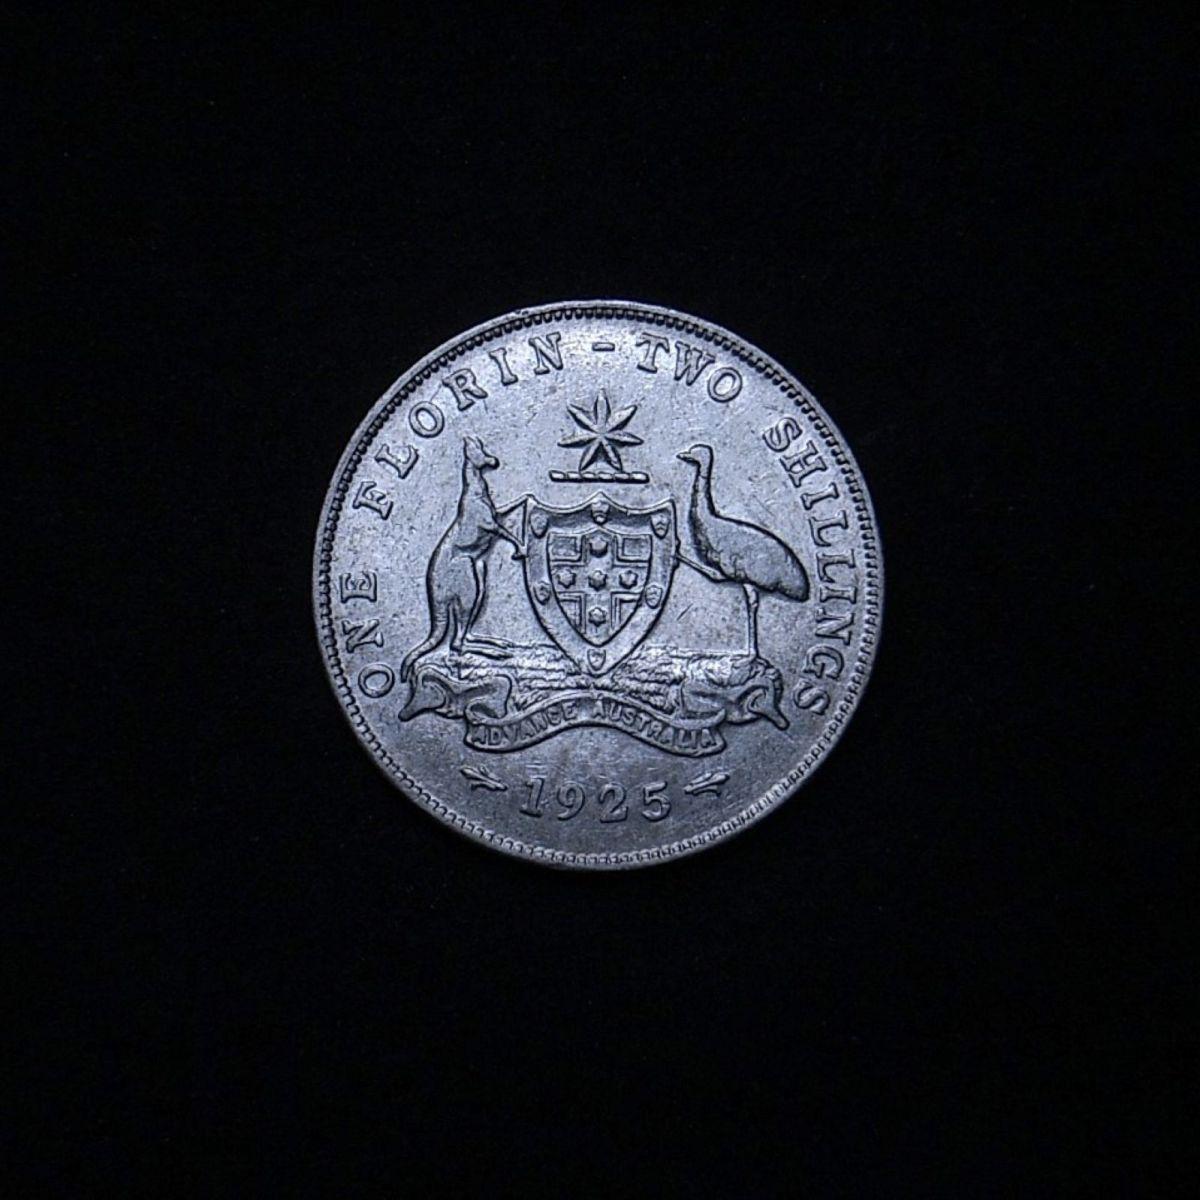 Aussie 1925 florin reverse showing lustre